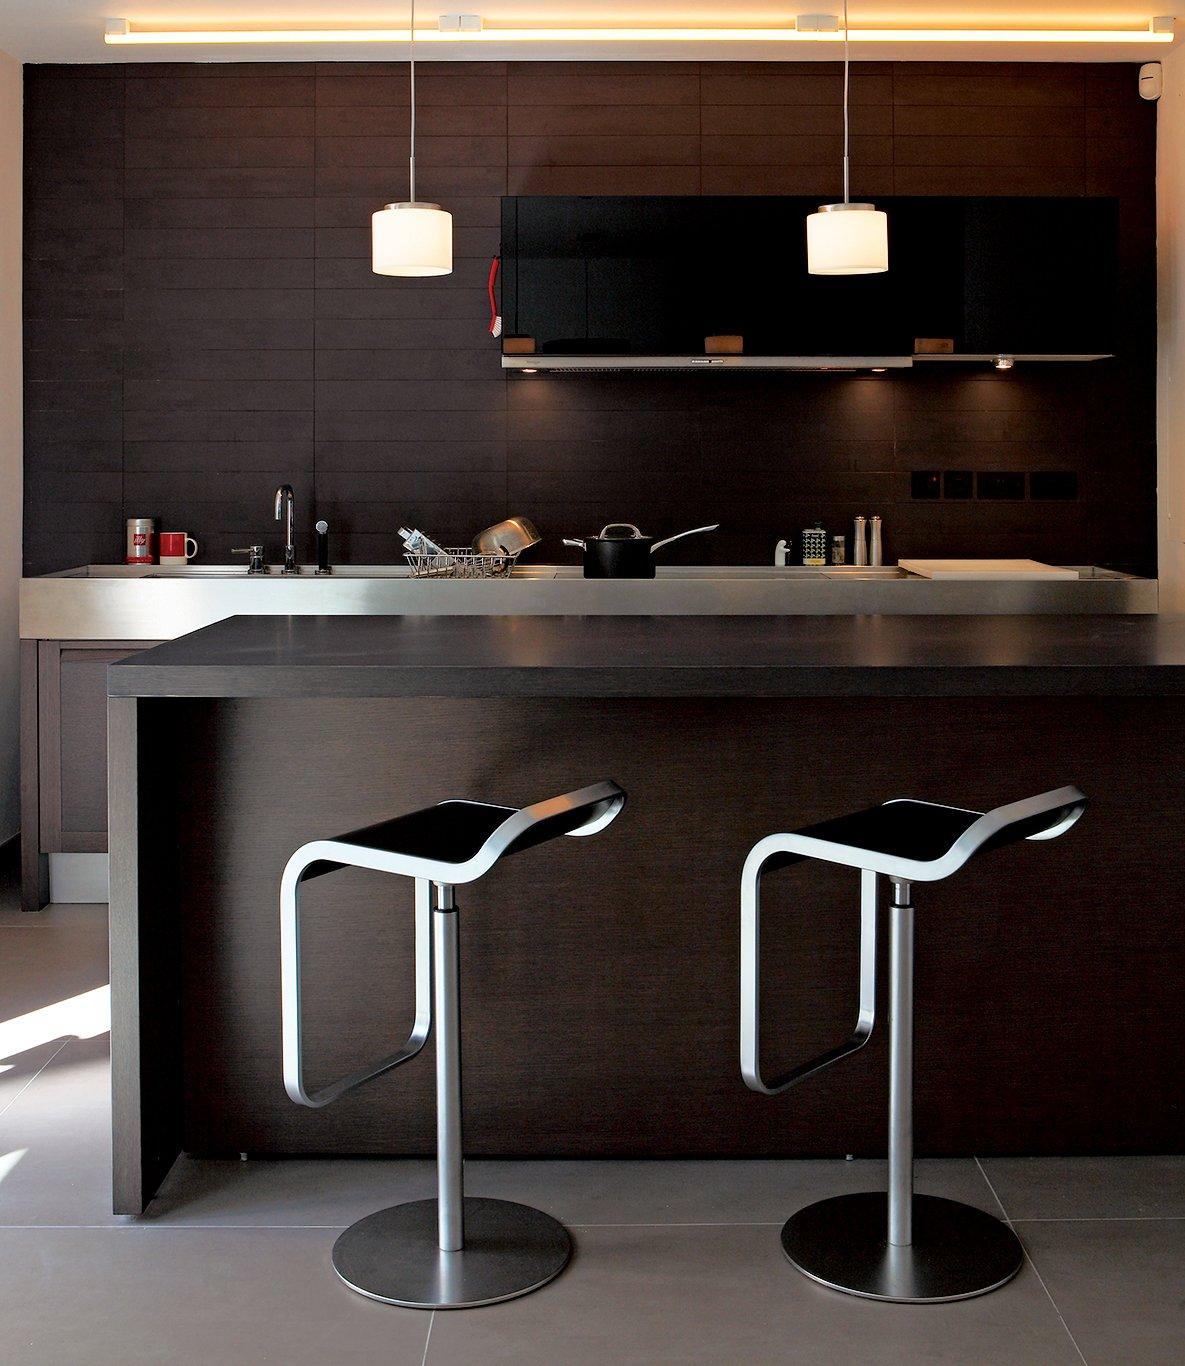 #seatingdesign #interior #inside #indoor #custom #clad #TheSunkenHouse #photographer #EdReeve #DavidAdjaye #london #DeBeauvoir #cedar #modern #stool #kitchen  100+ Best Modern Seating Designs by Dwell